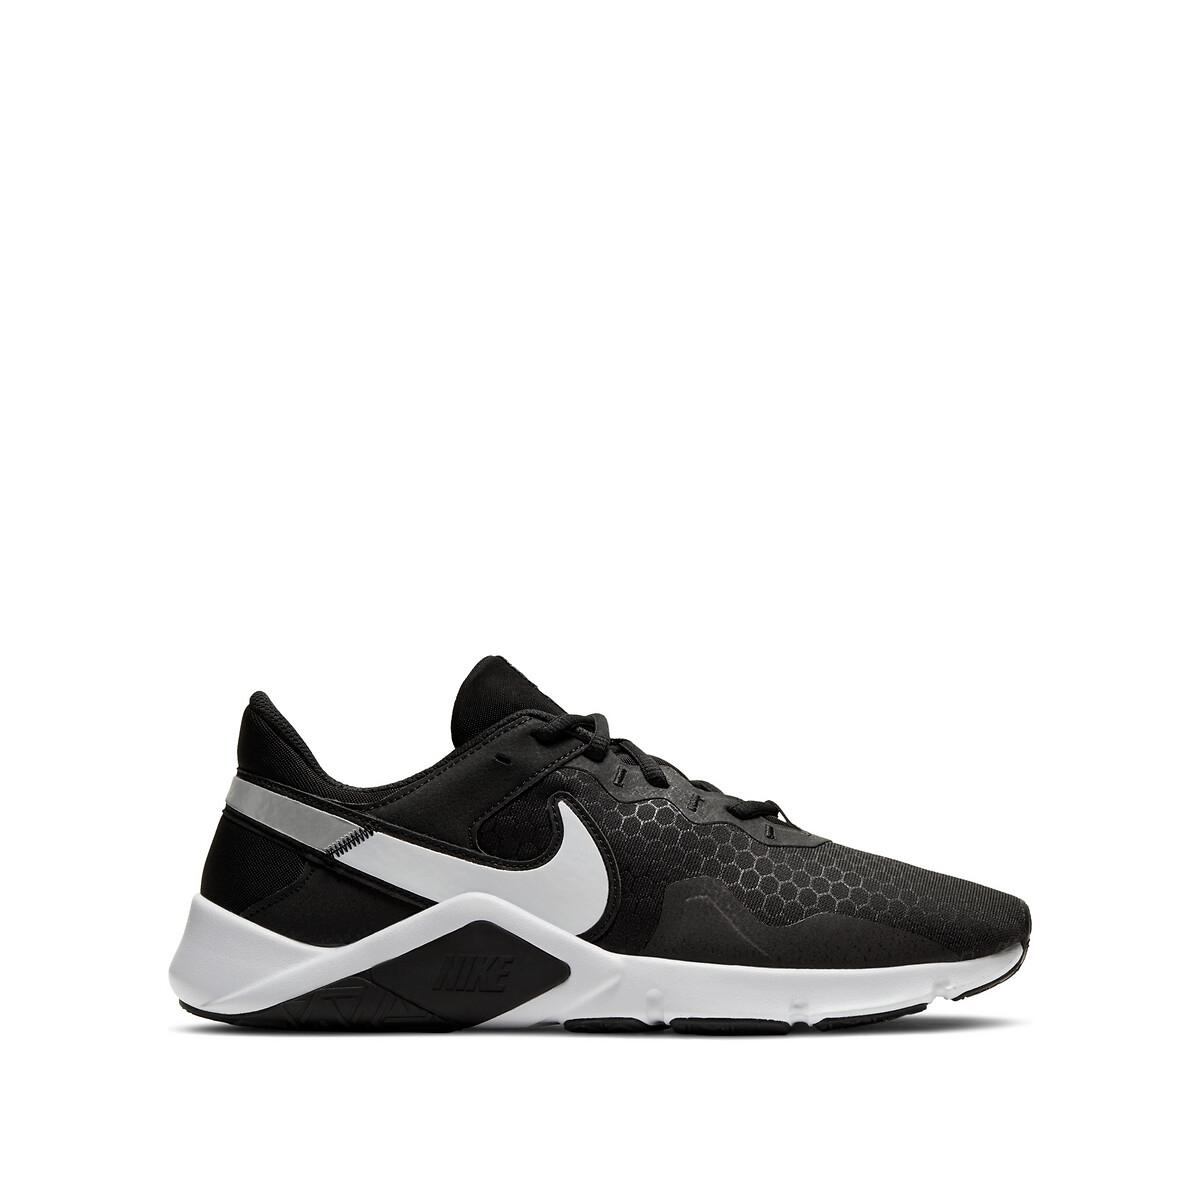 Nike Legend Essential 2 Heren Black/Metallic Silver/White Heren online kopen